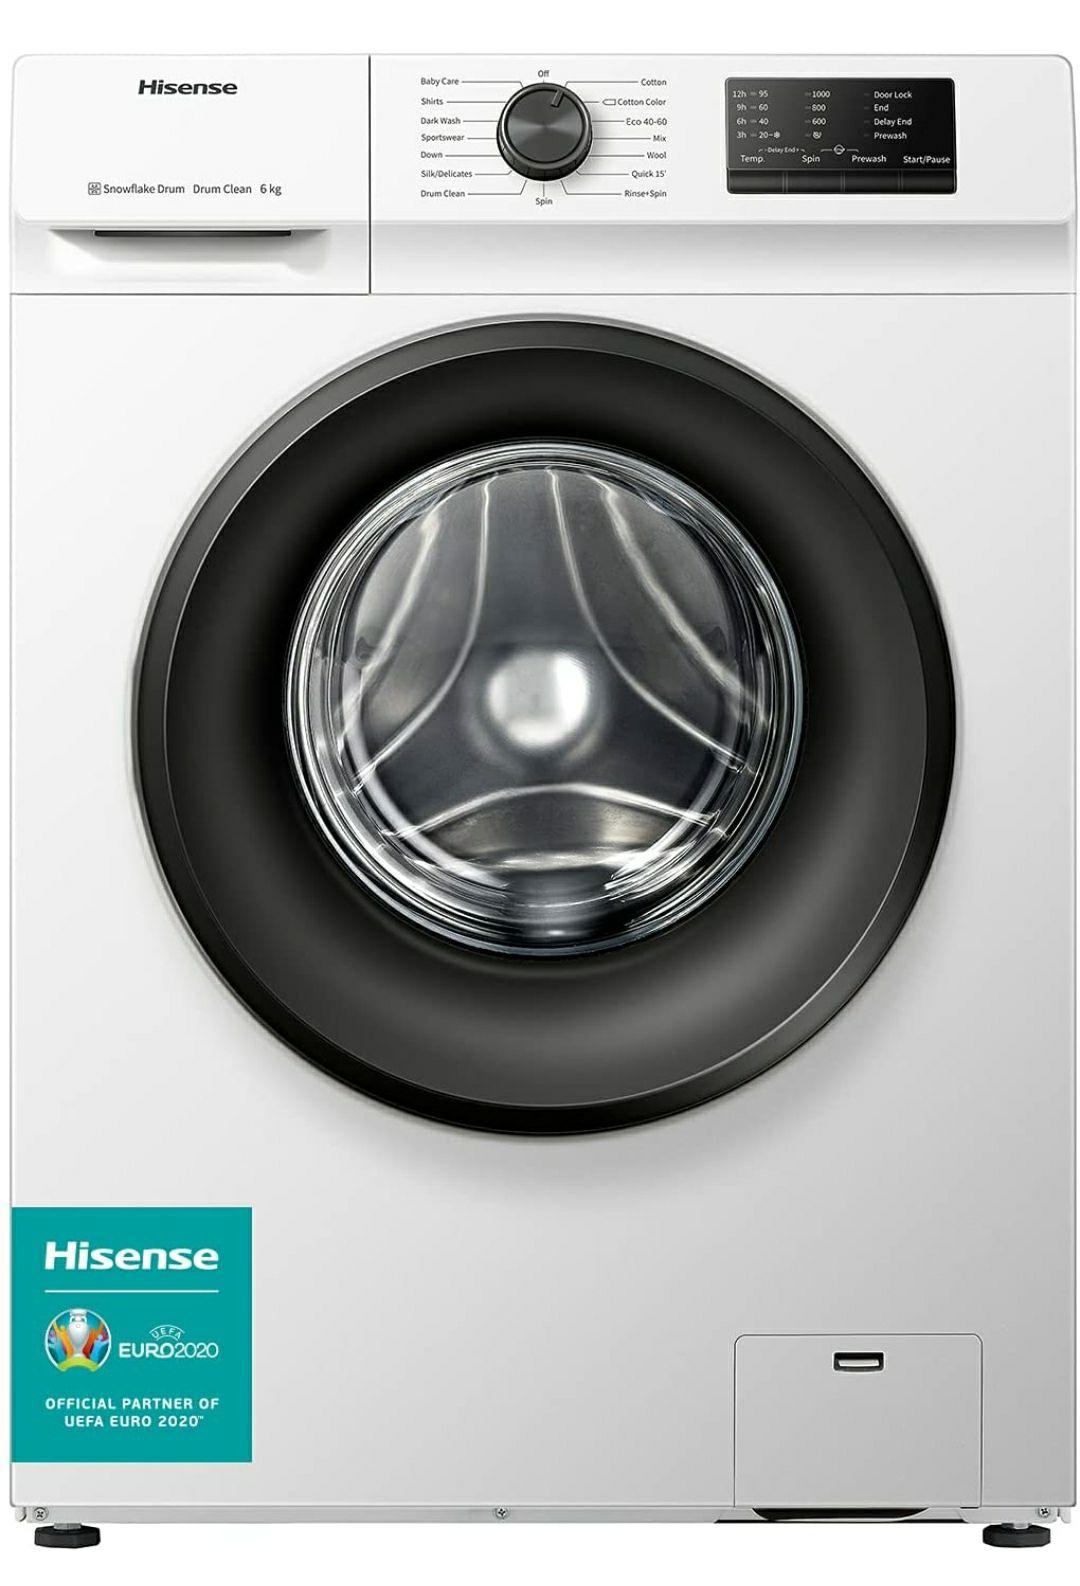 Lavadora Hisense WFVC6010E 6 Kg, 1000 rpm, 15 Programas, Control de balanceo inteligente, Display LED